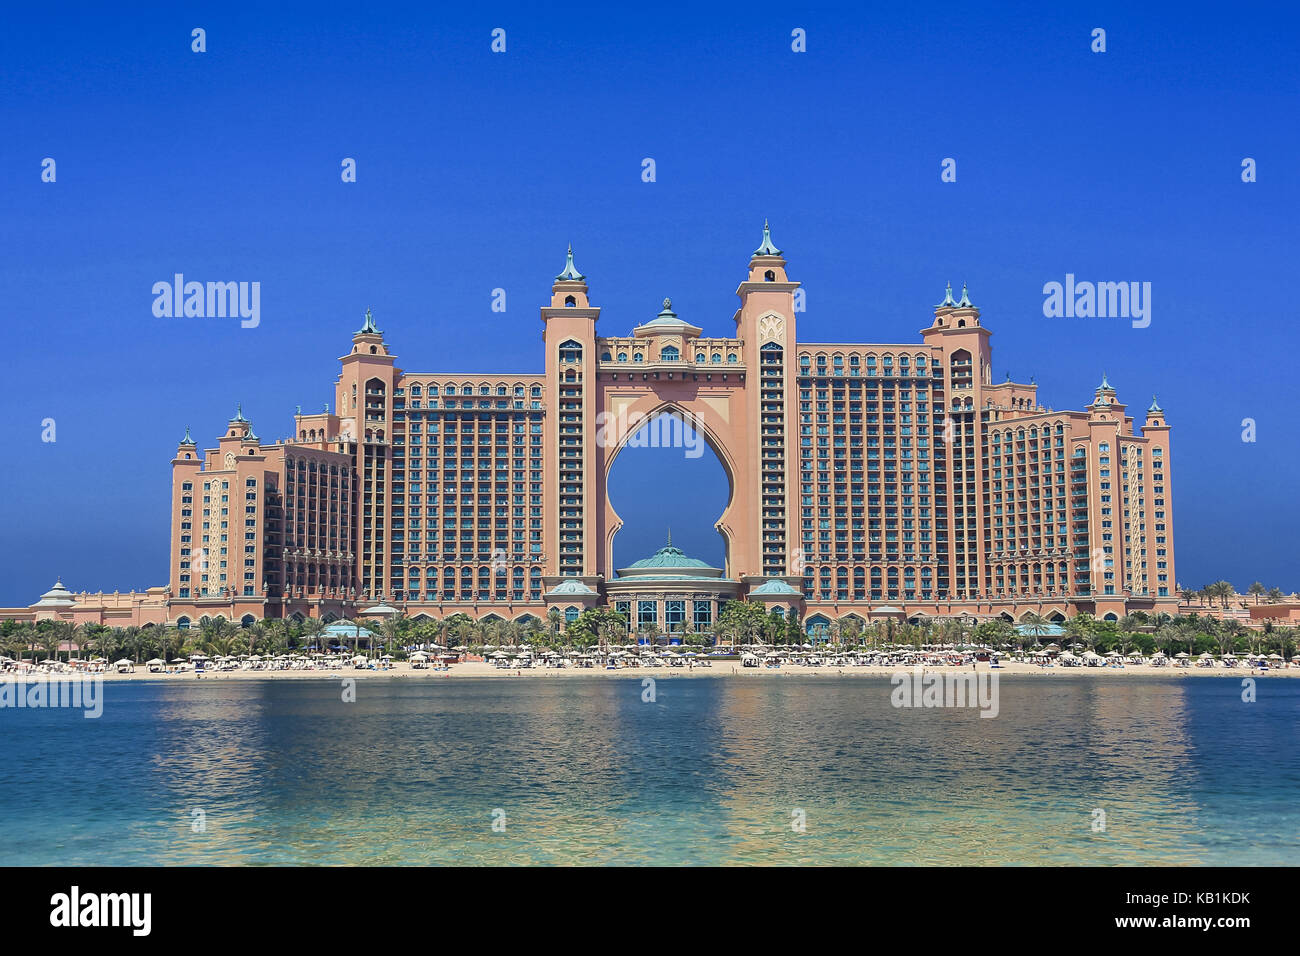 Atlantis dubai stock photos atlantis dubai stock images for Dubai palm hotel